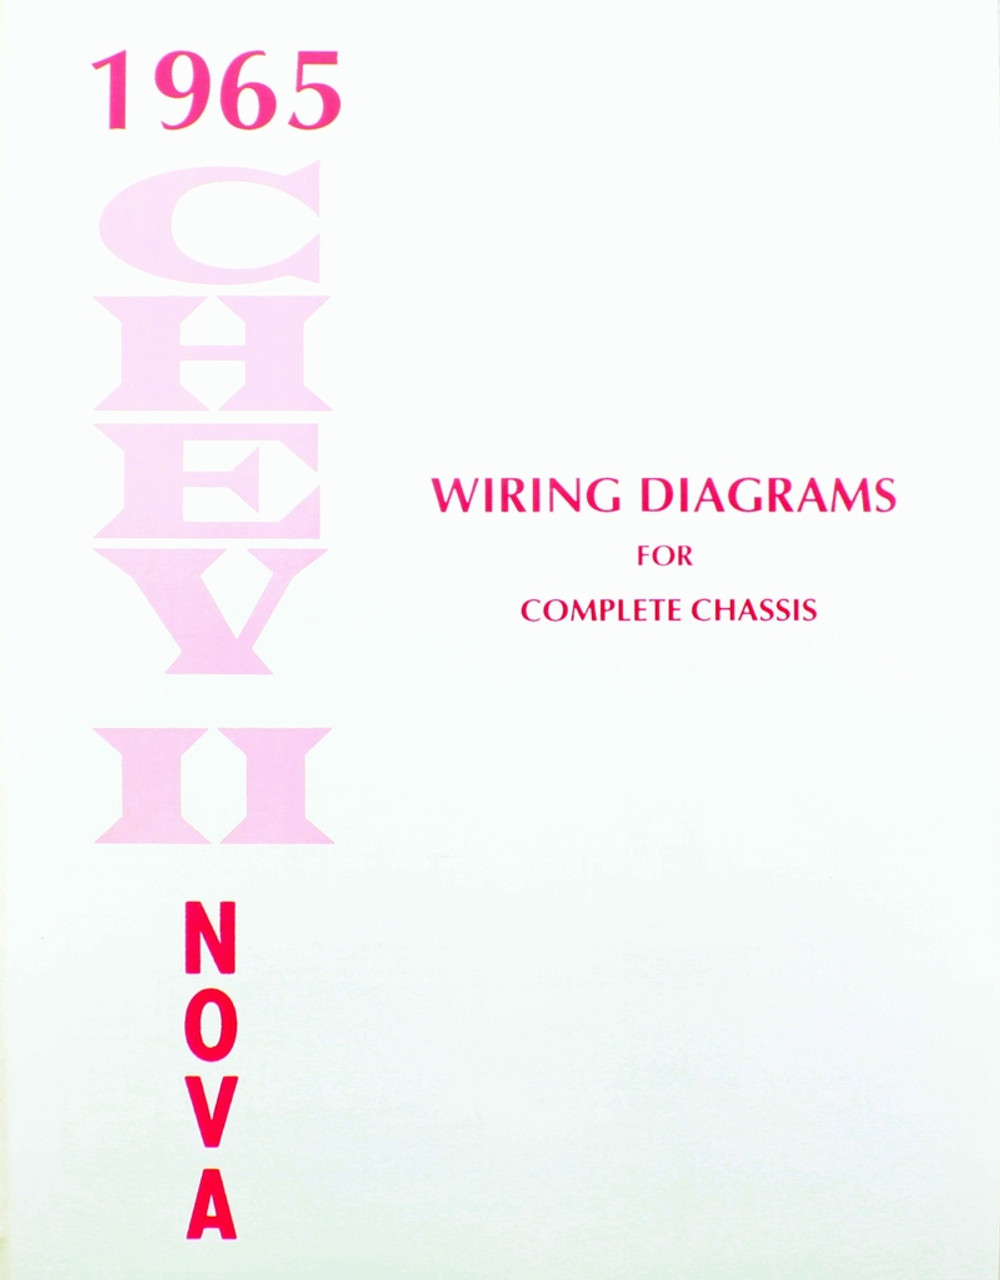 65 1965 chevy nova electrical wiring diagram manual i 5 classic chevy rh i5chevy com Chevy Nova Wiring Diagram 1965 Chevy Nova Wiring Diagram